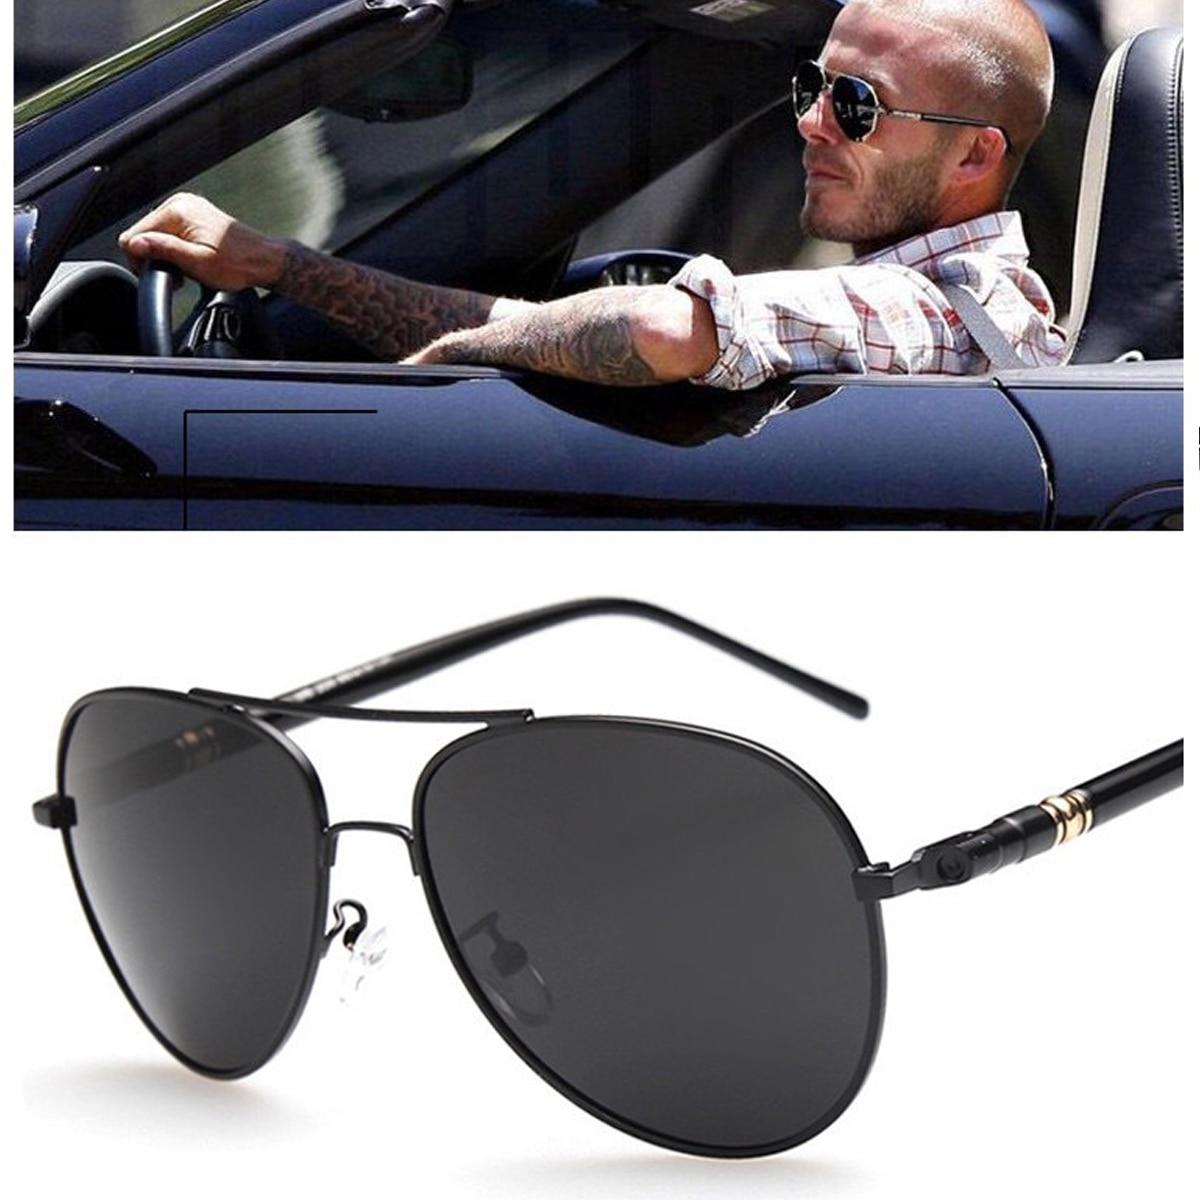 Aviation Metail Frame Quality Oversized Spring Leg Alloy Men Sunglasses Polarized Brand Design Pilot Male Sun Glasses Driving stylish golden alloy leg matte black frame sunglasses for women